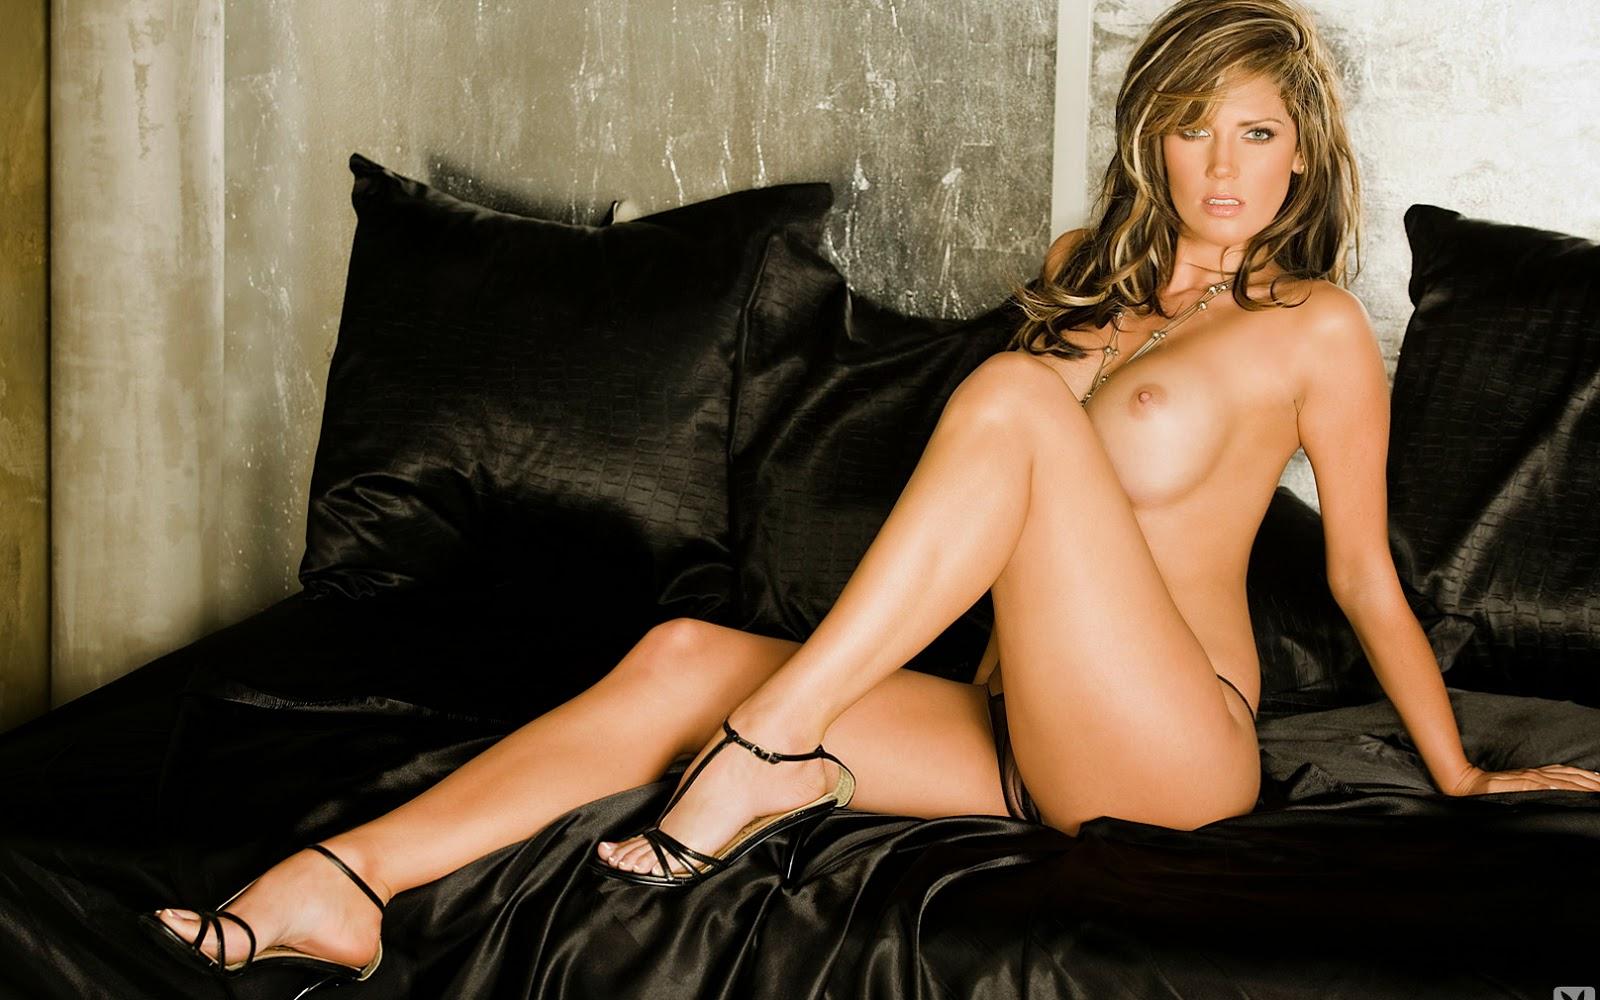 Crystal Mccahil Nude 9